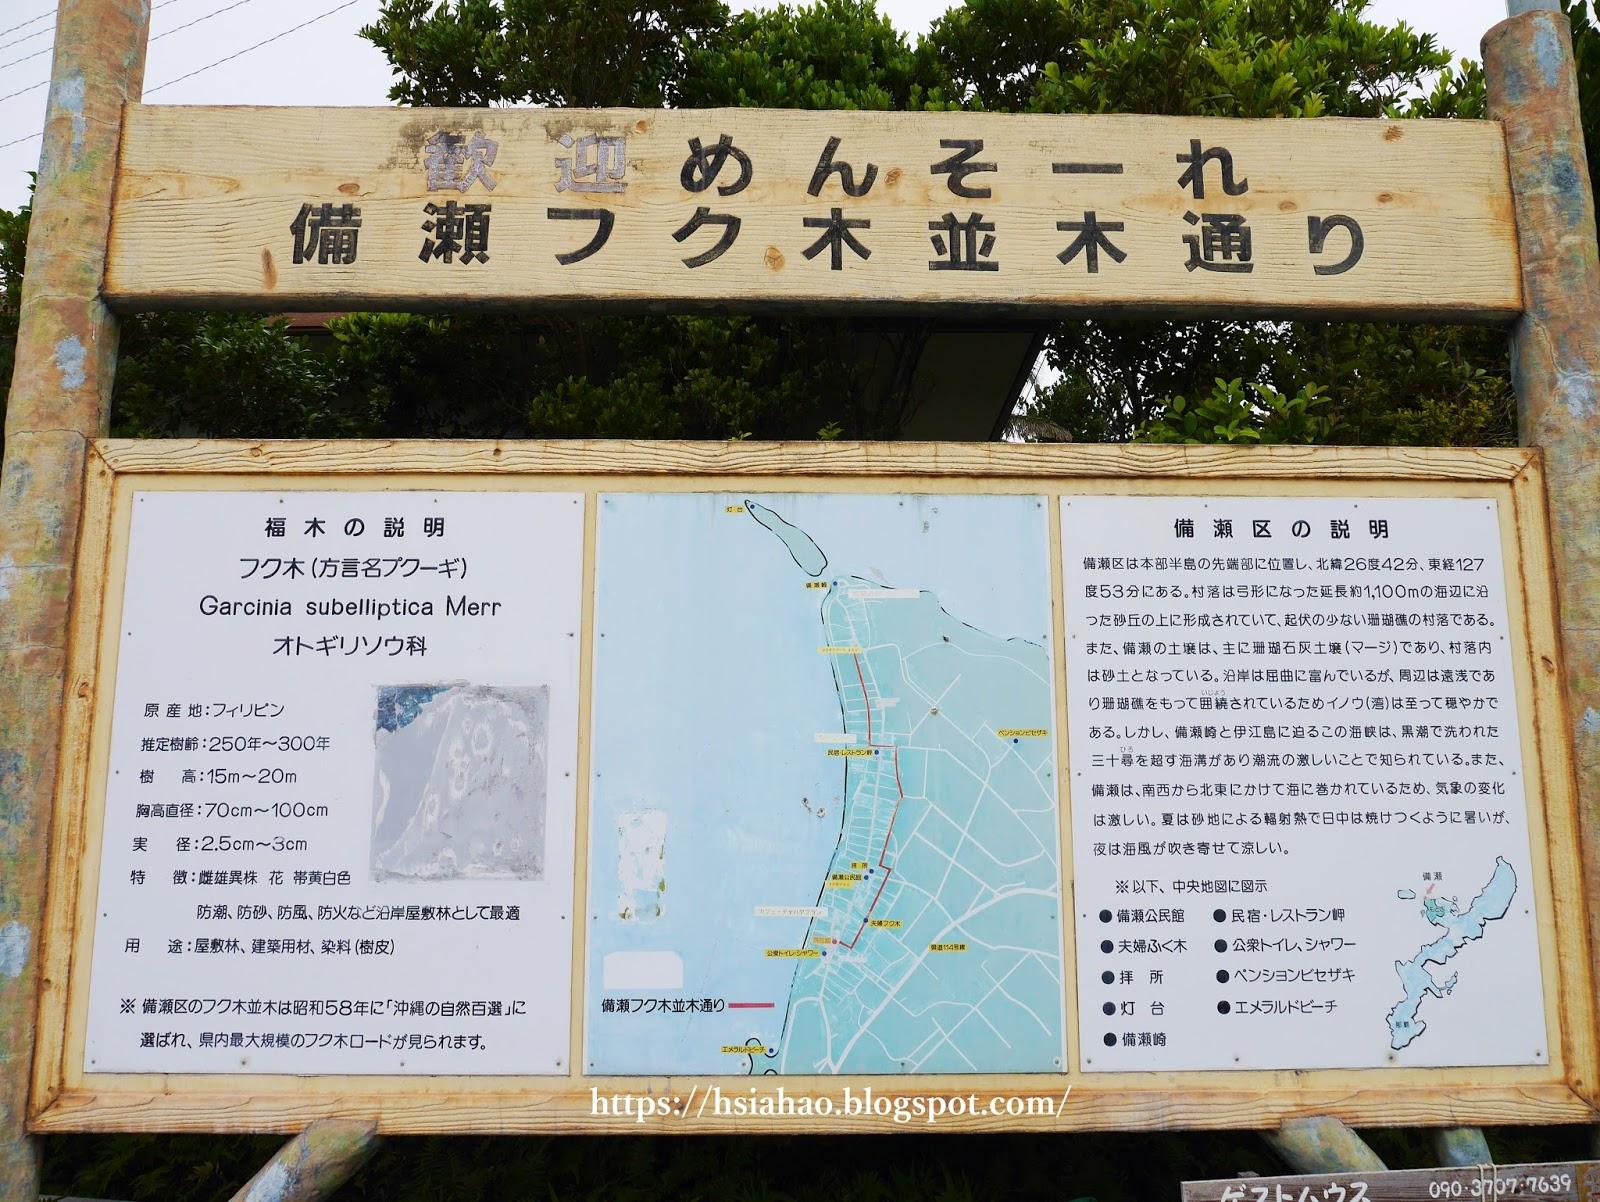 沖繩-海洋博公園-備瀨福木林道-備瀬フク木並木通り-景點-自由行-旅遊-旅行-okinawa-ocean-expo-park-Churaumi